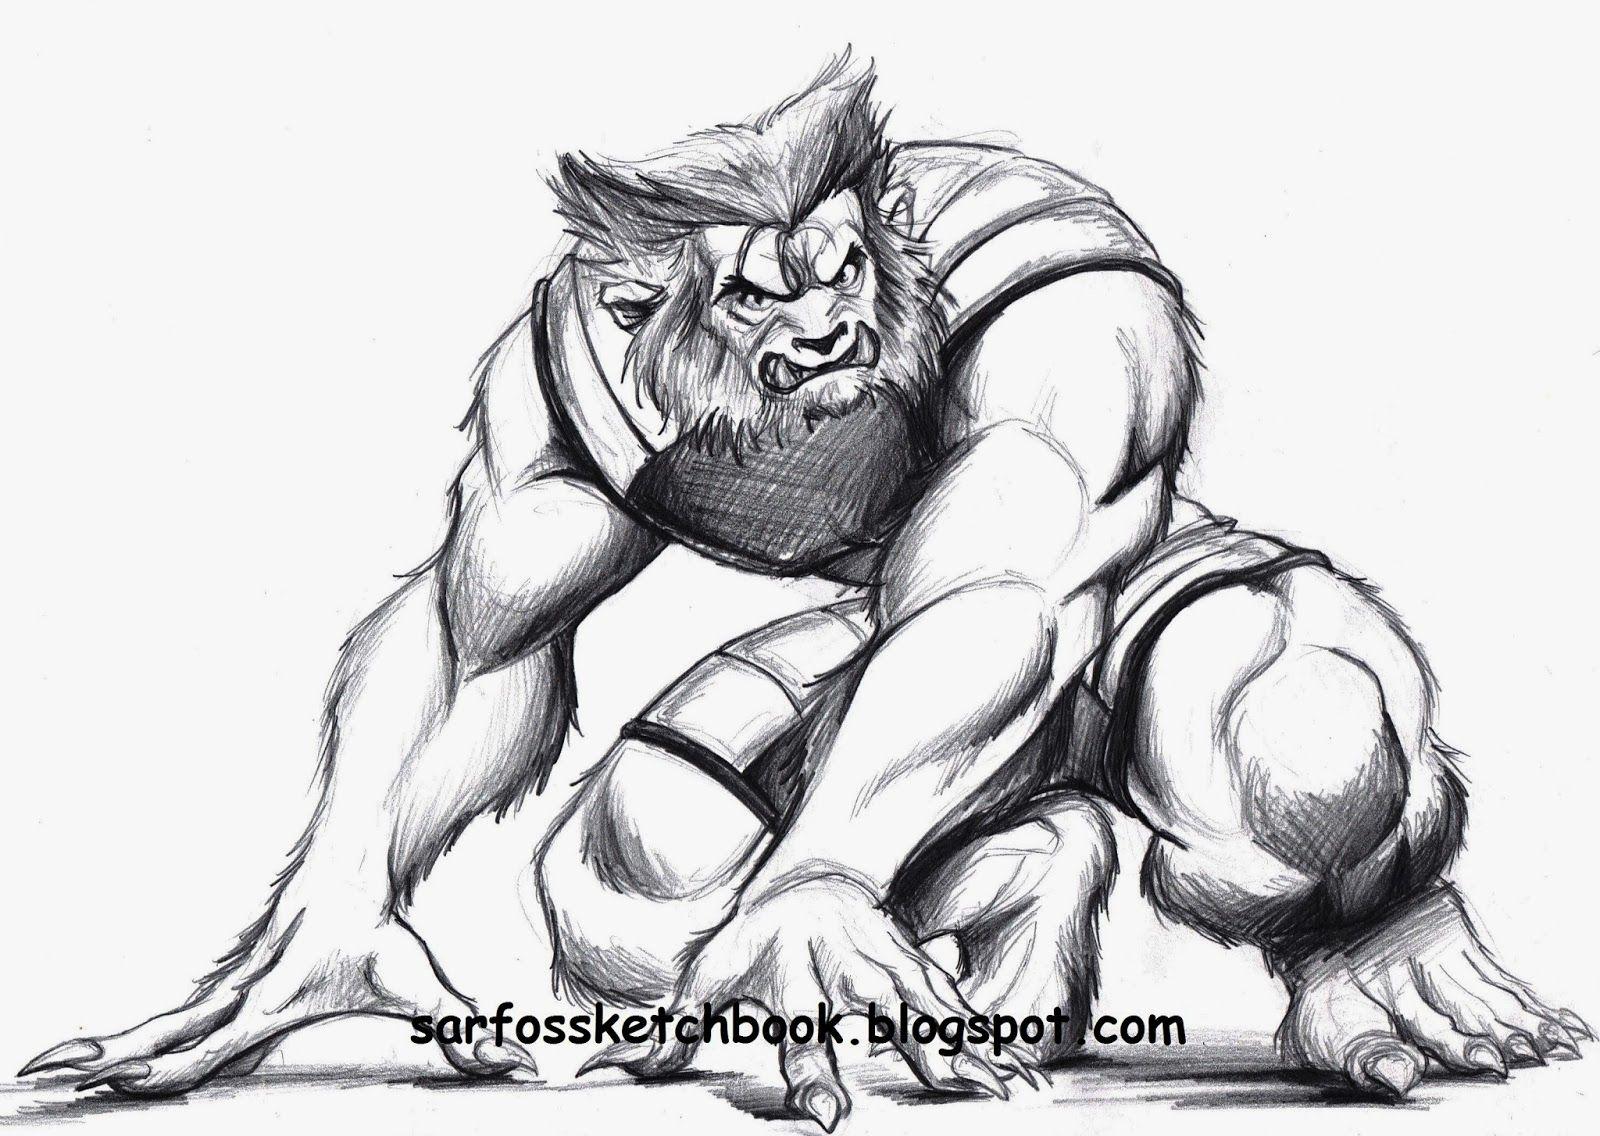 X Men Beast Coloring Pages Man Beast Superhero Coloring Pages Superhero Coloring